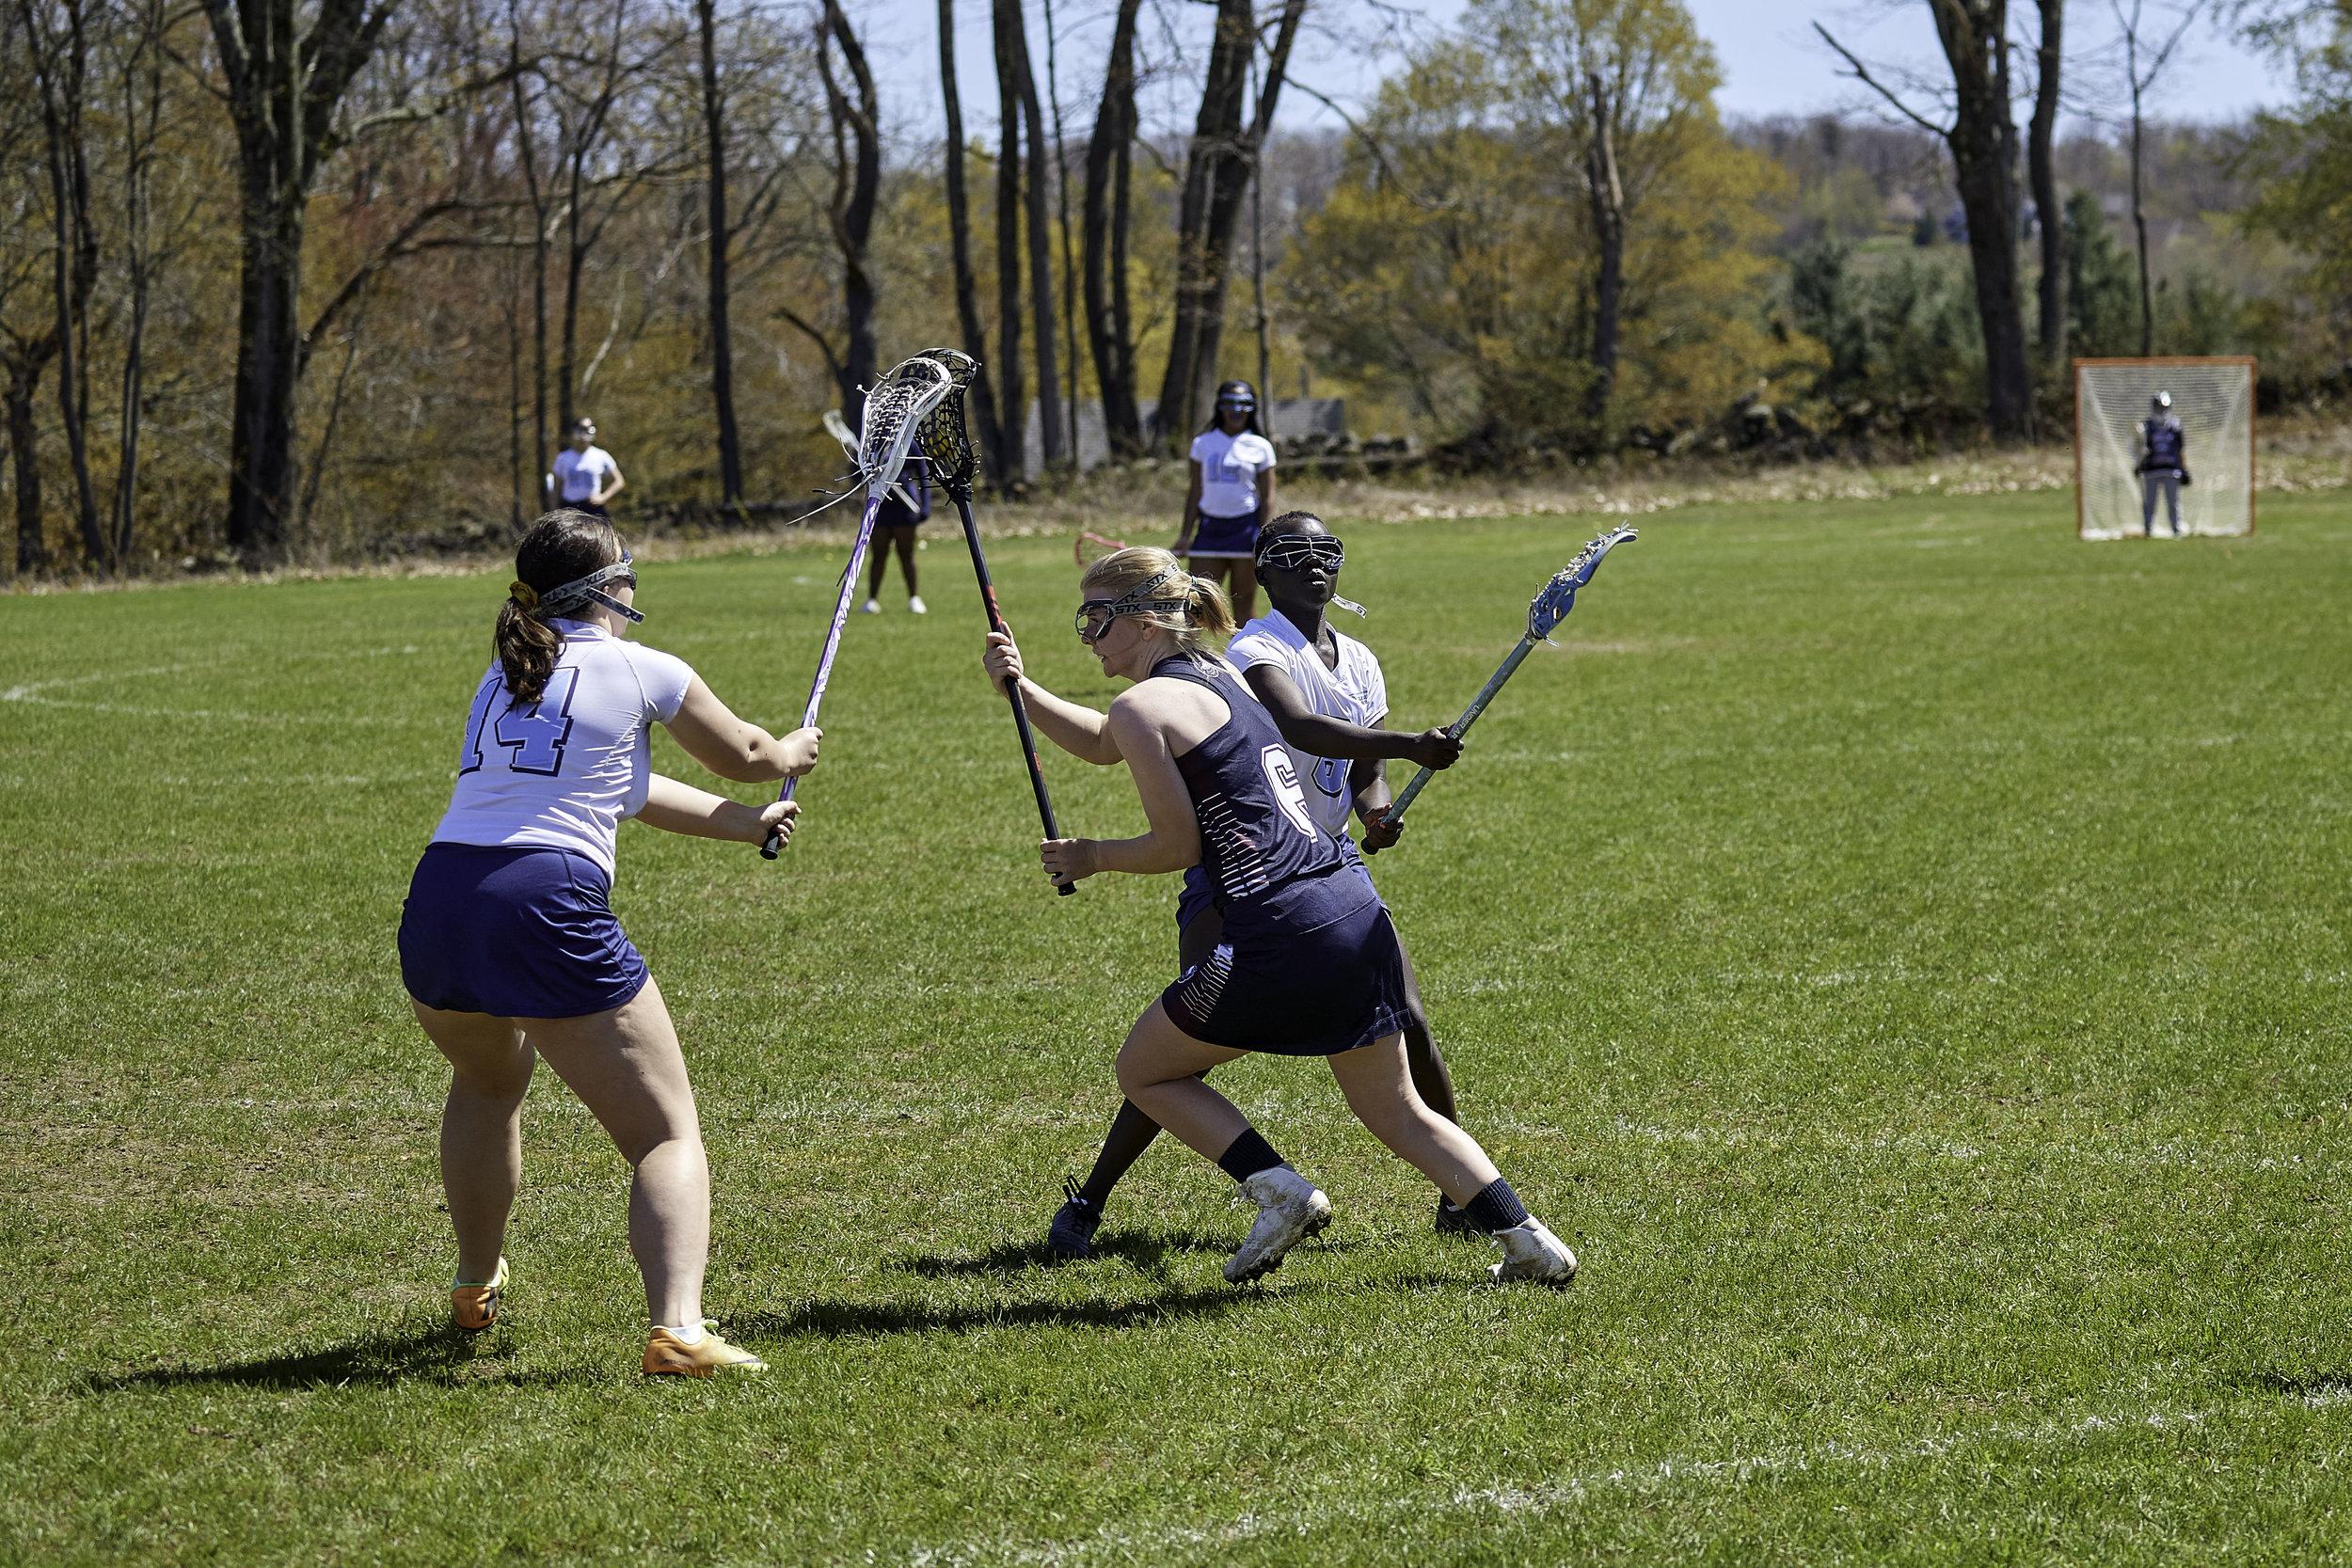 Girls Lacrosse vs. Stoneleigh Burnham School - May 11, 2019 - May 10, 2019193183.jpg